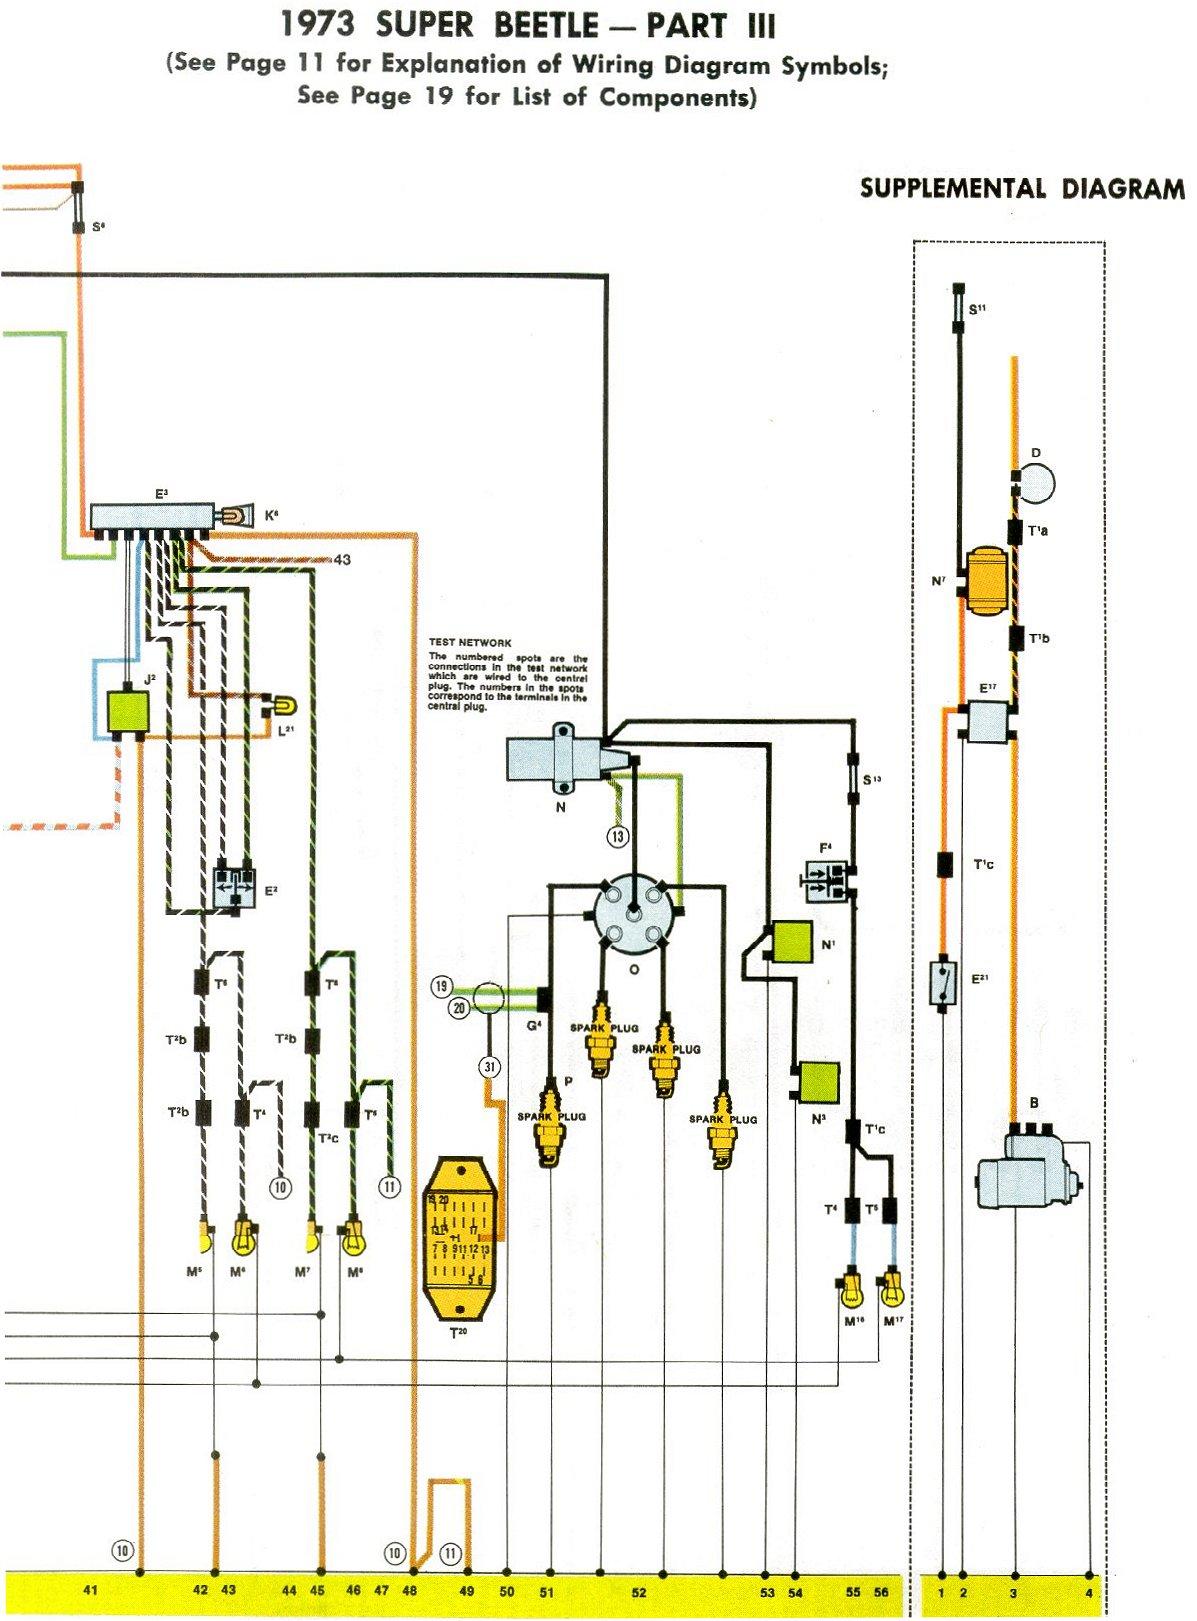 1973 Super Beetle Wiring Diagram TheGoldenBug Com